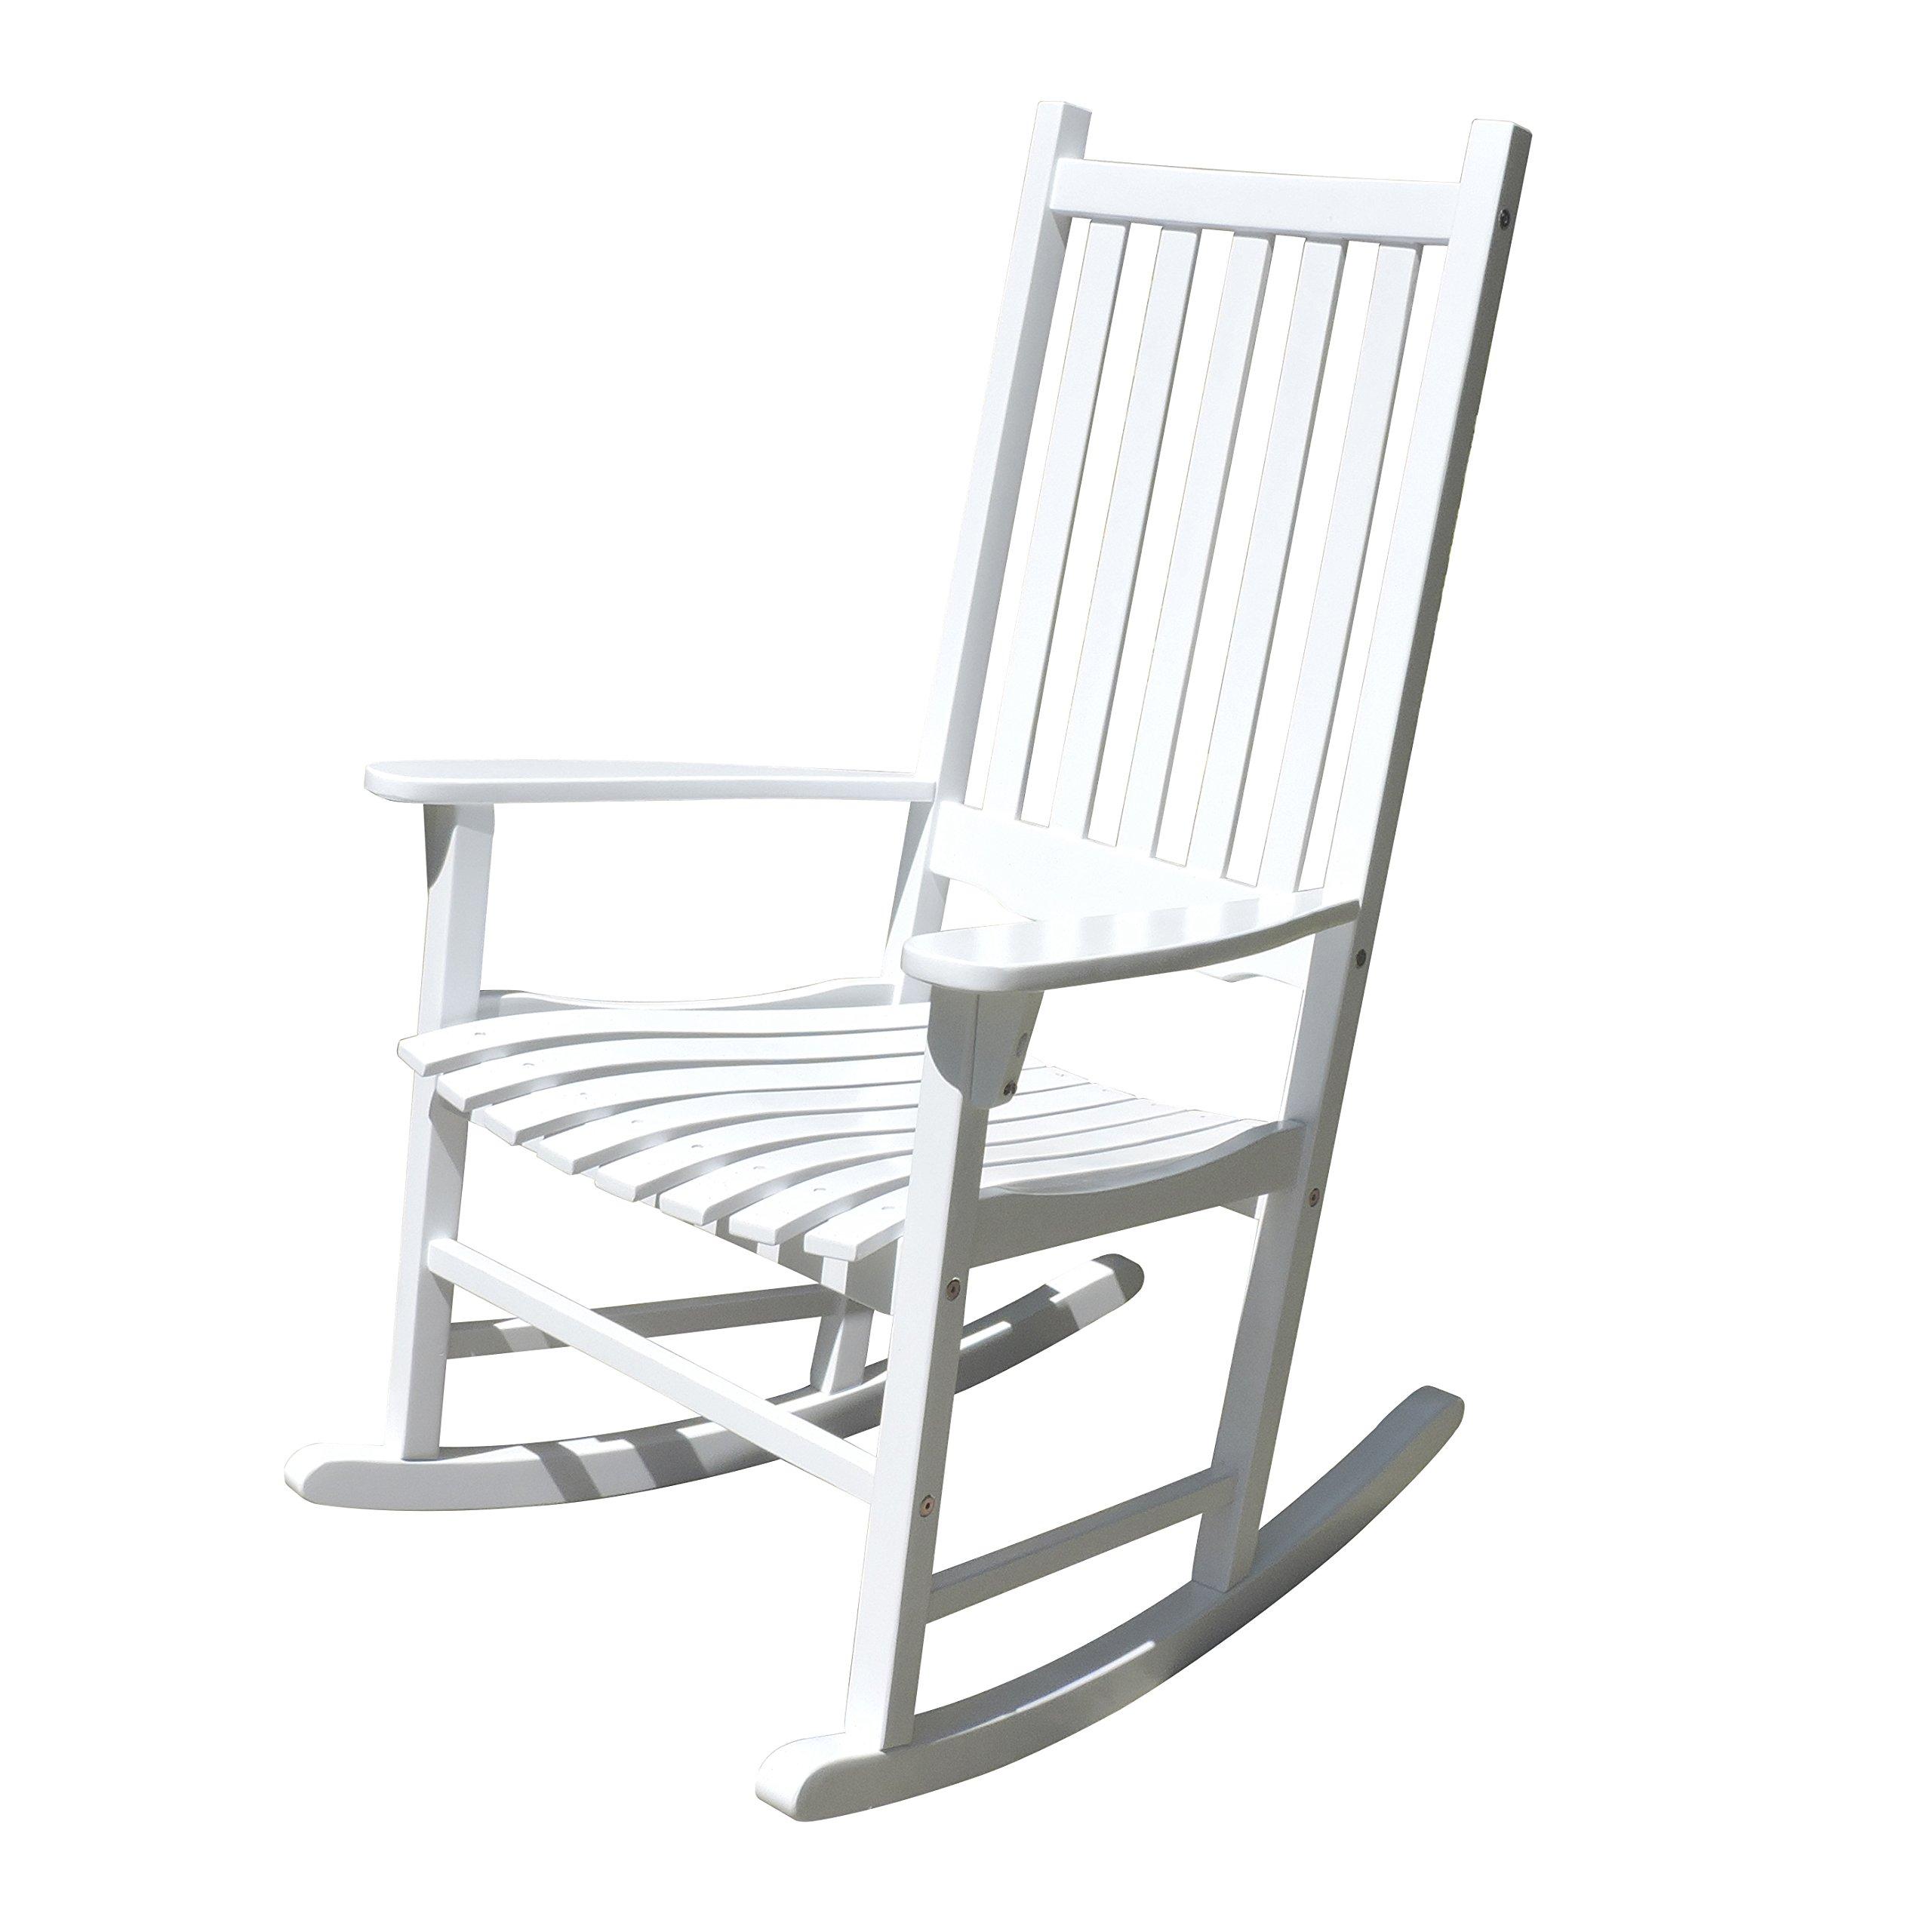 Merry Garden - White Porch Rocker/Rocking Chair Acacia Wood by Merry Garden